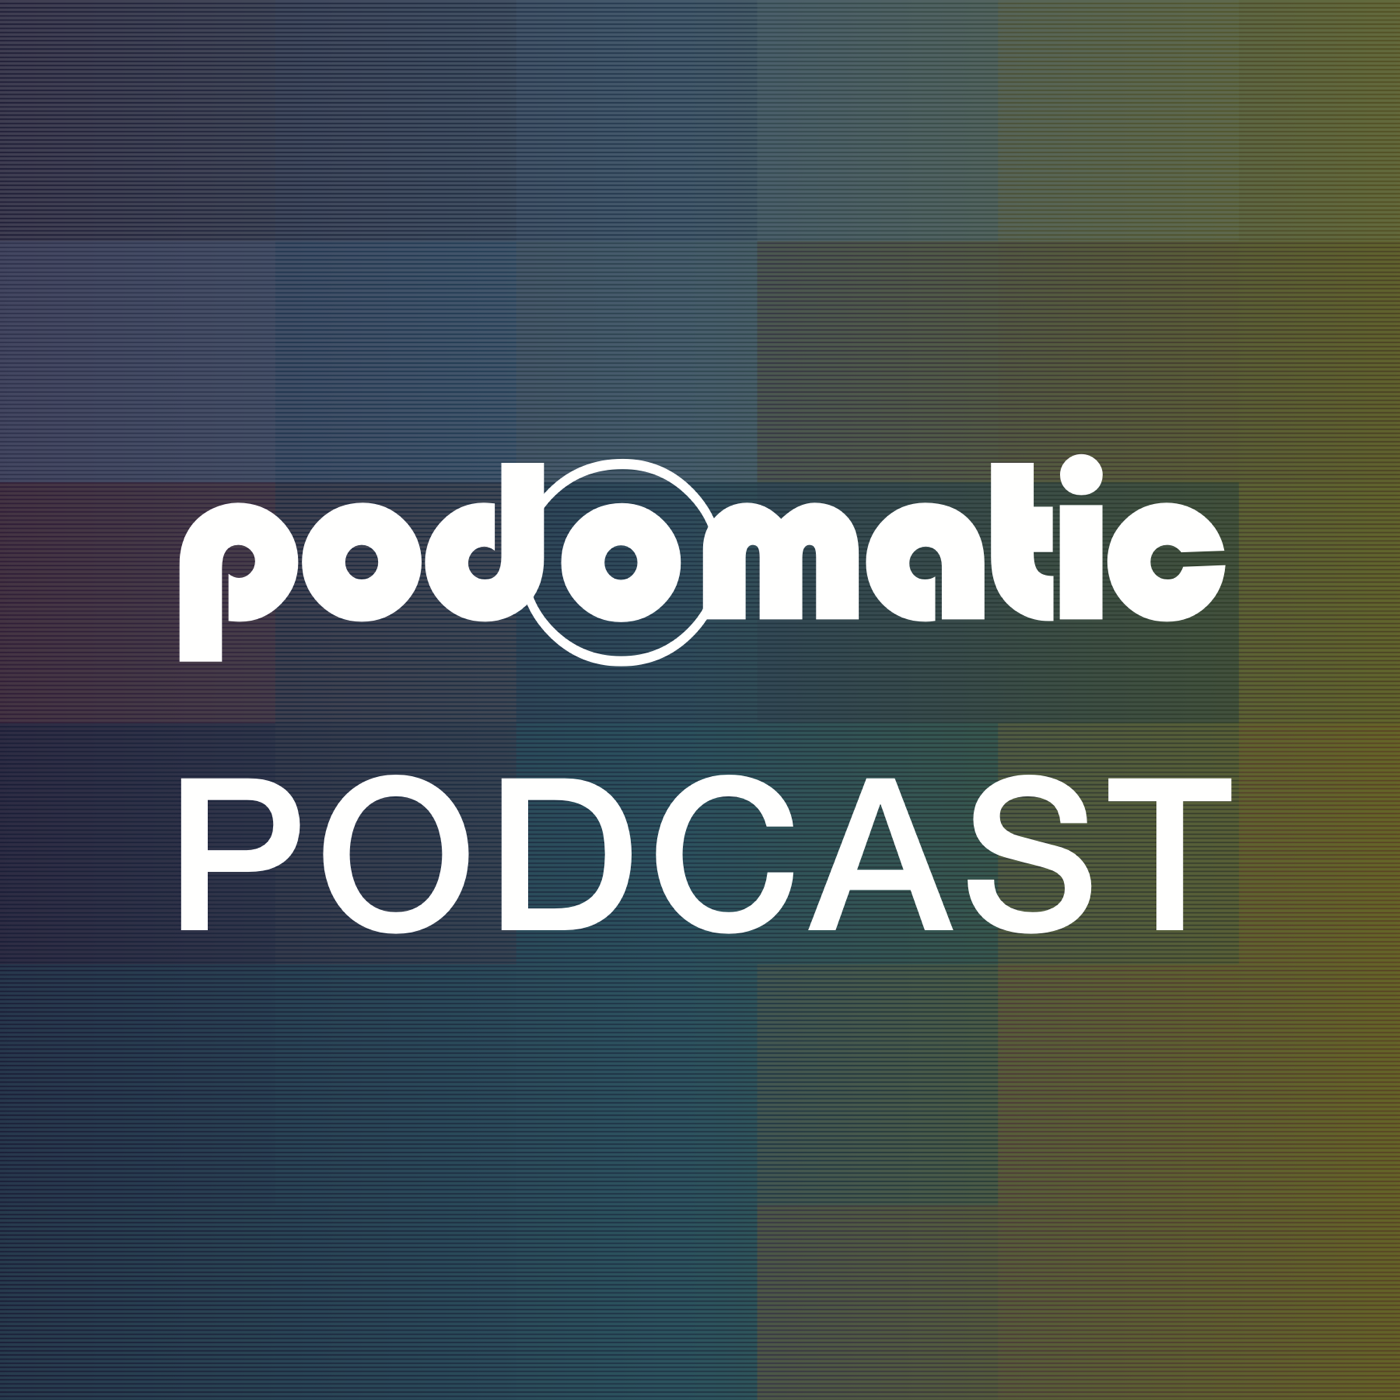 Eleanor Dexter's Podcast